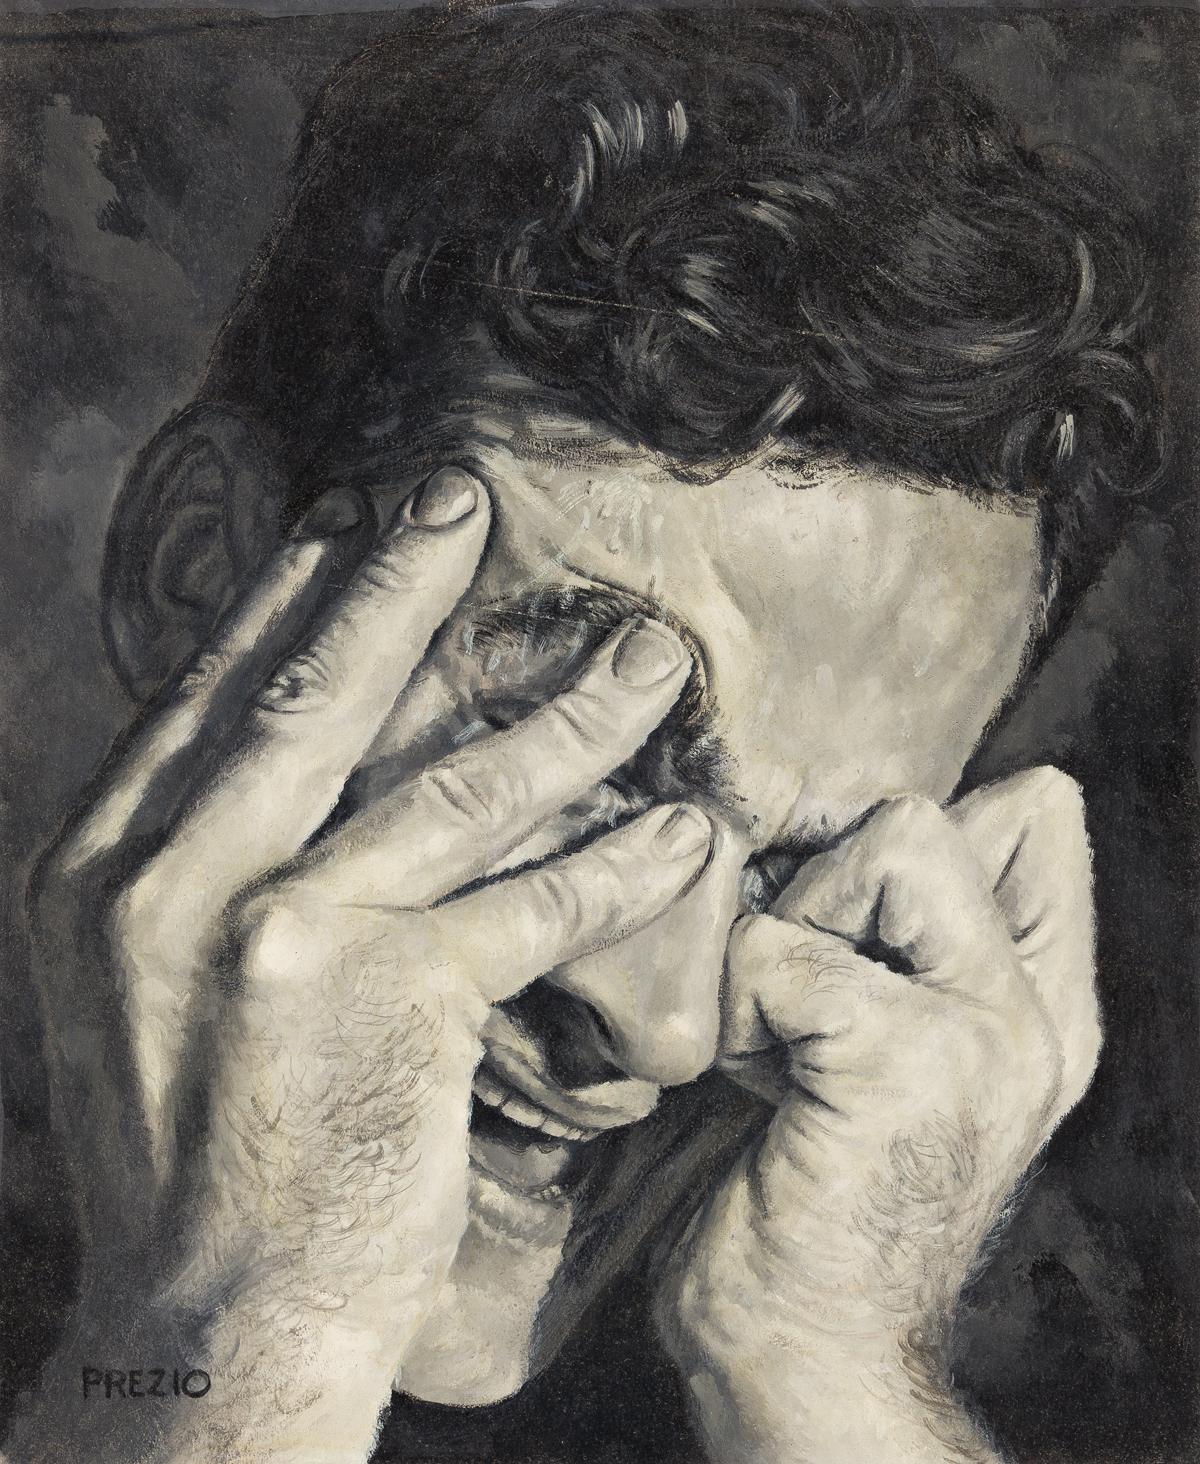 VICTOR PREZIO (1924-1976) I see, said the blind man.